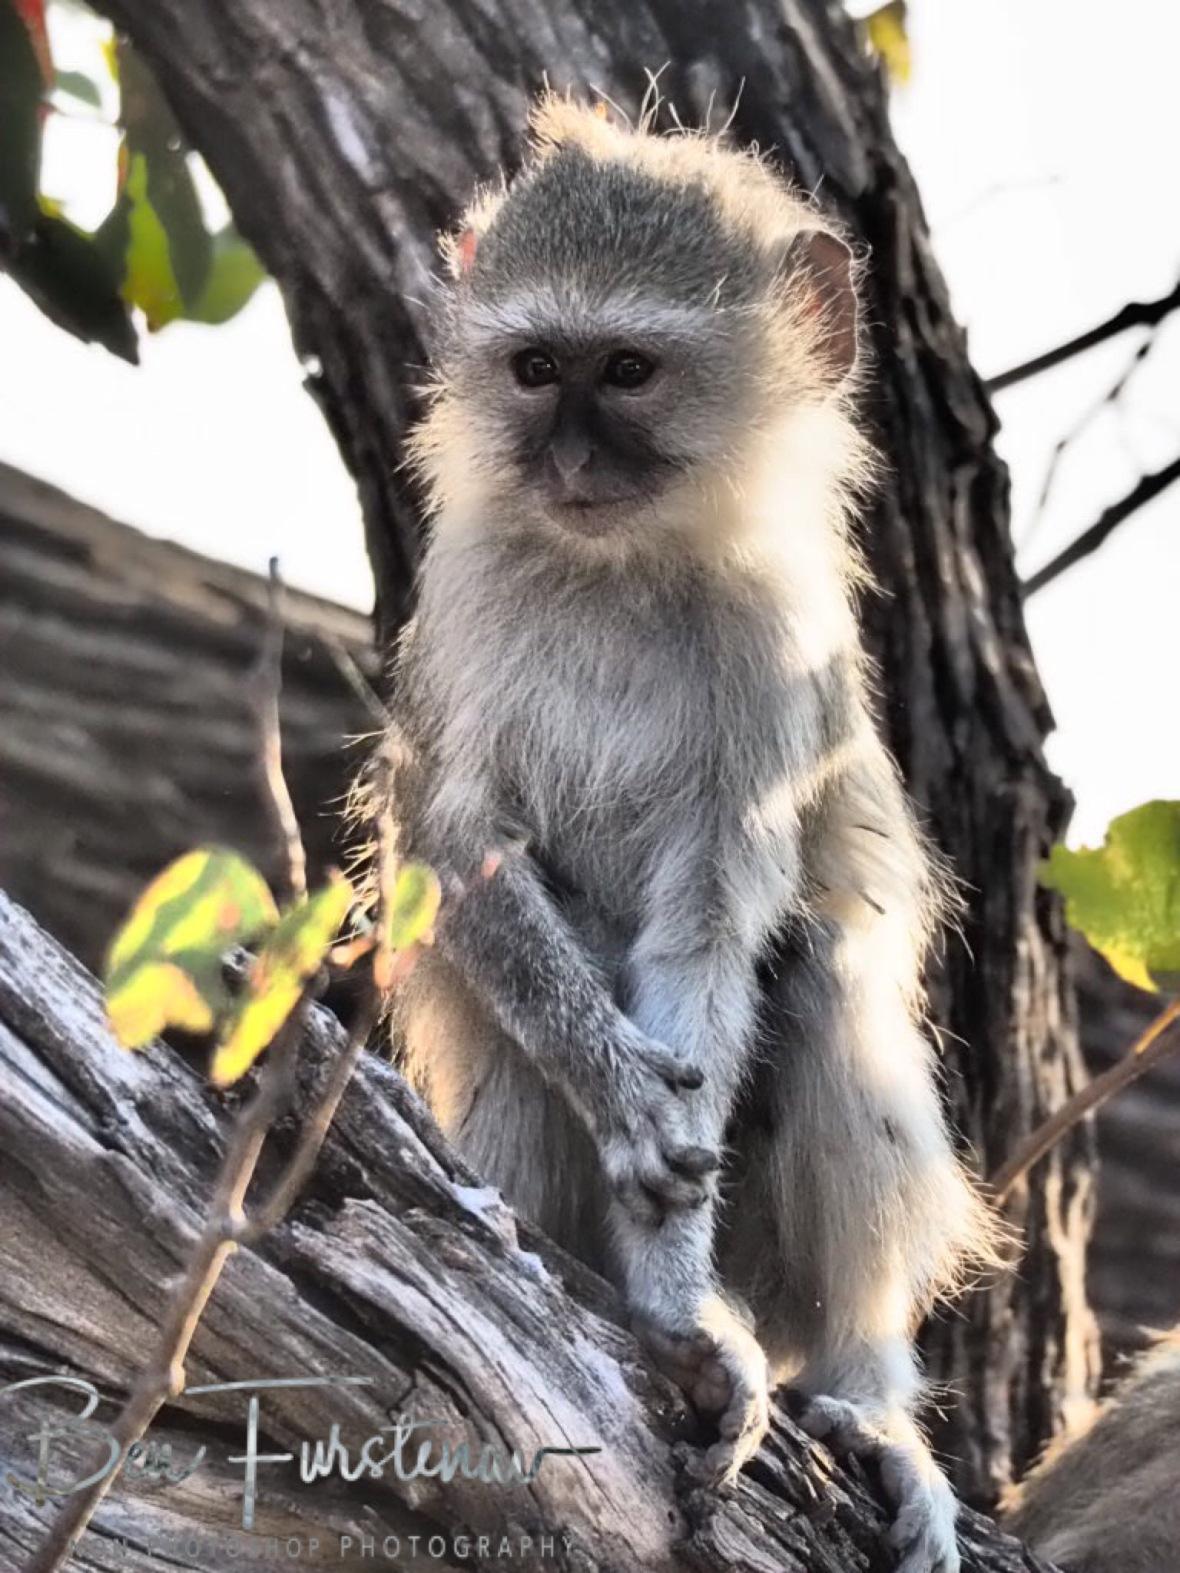 Almost human like, Moremi National Park, Okavango Delta, Botswana